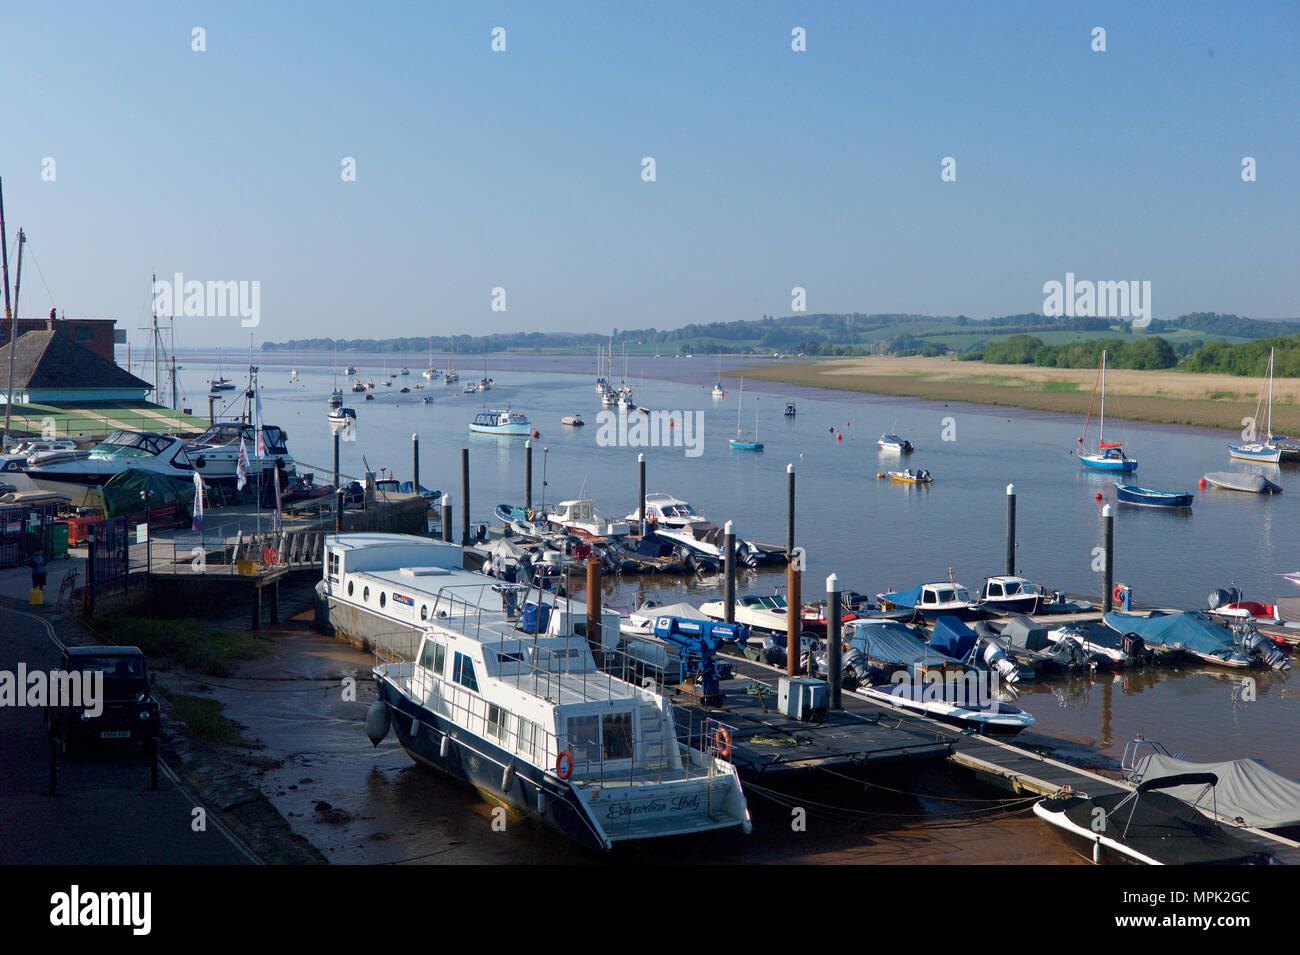 Boatyard and marina at Topsham, Devon, UK - Stock Image